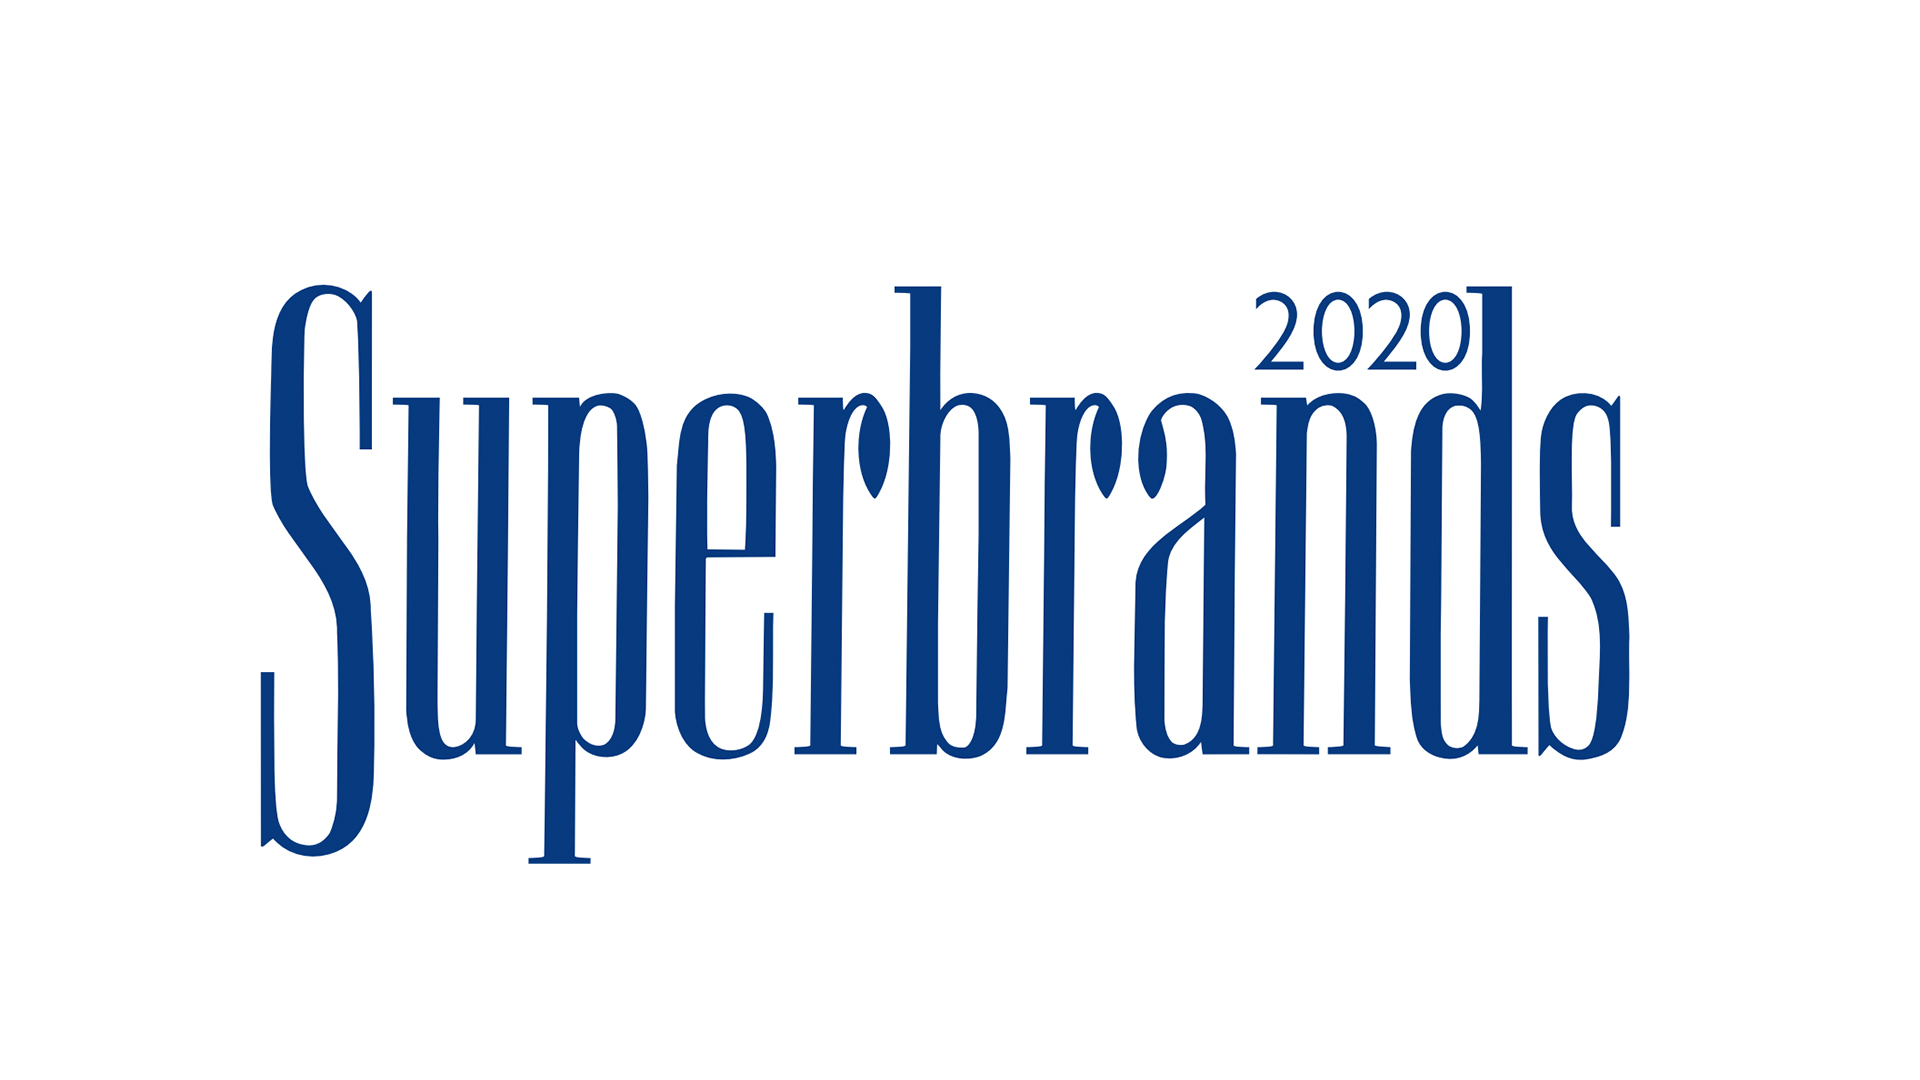 8. alkalommal Superbrands díjas a Westend